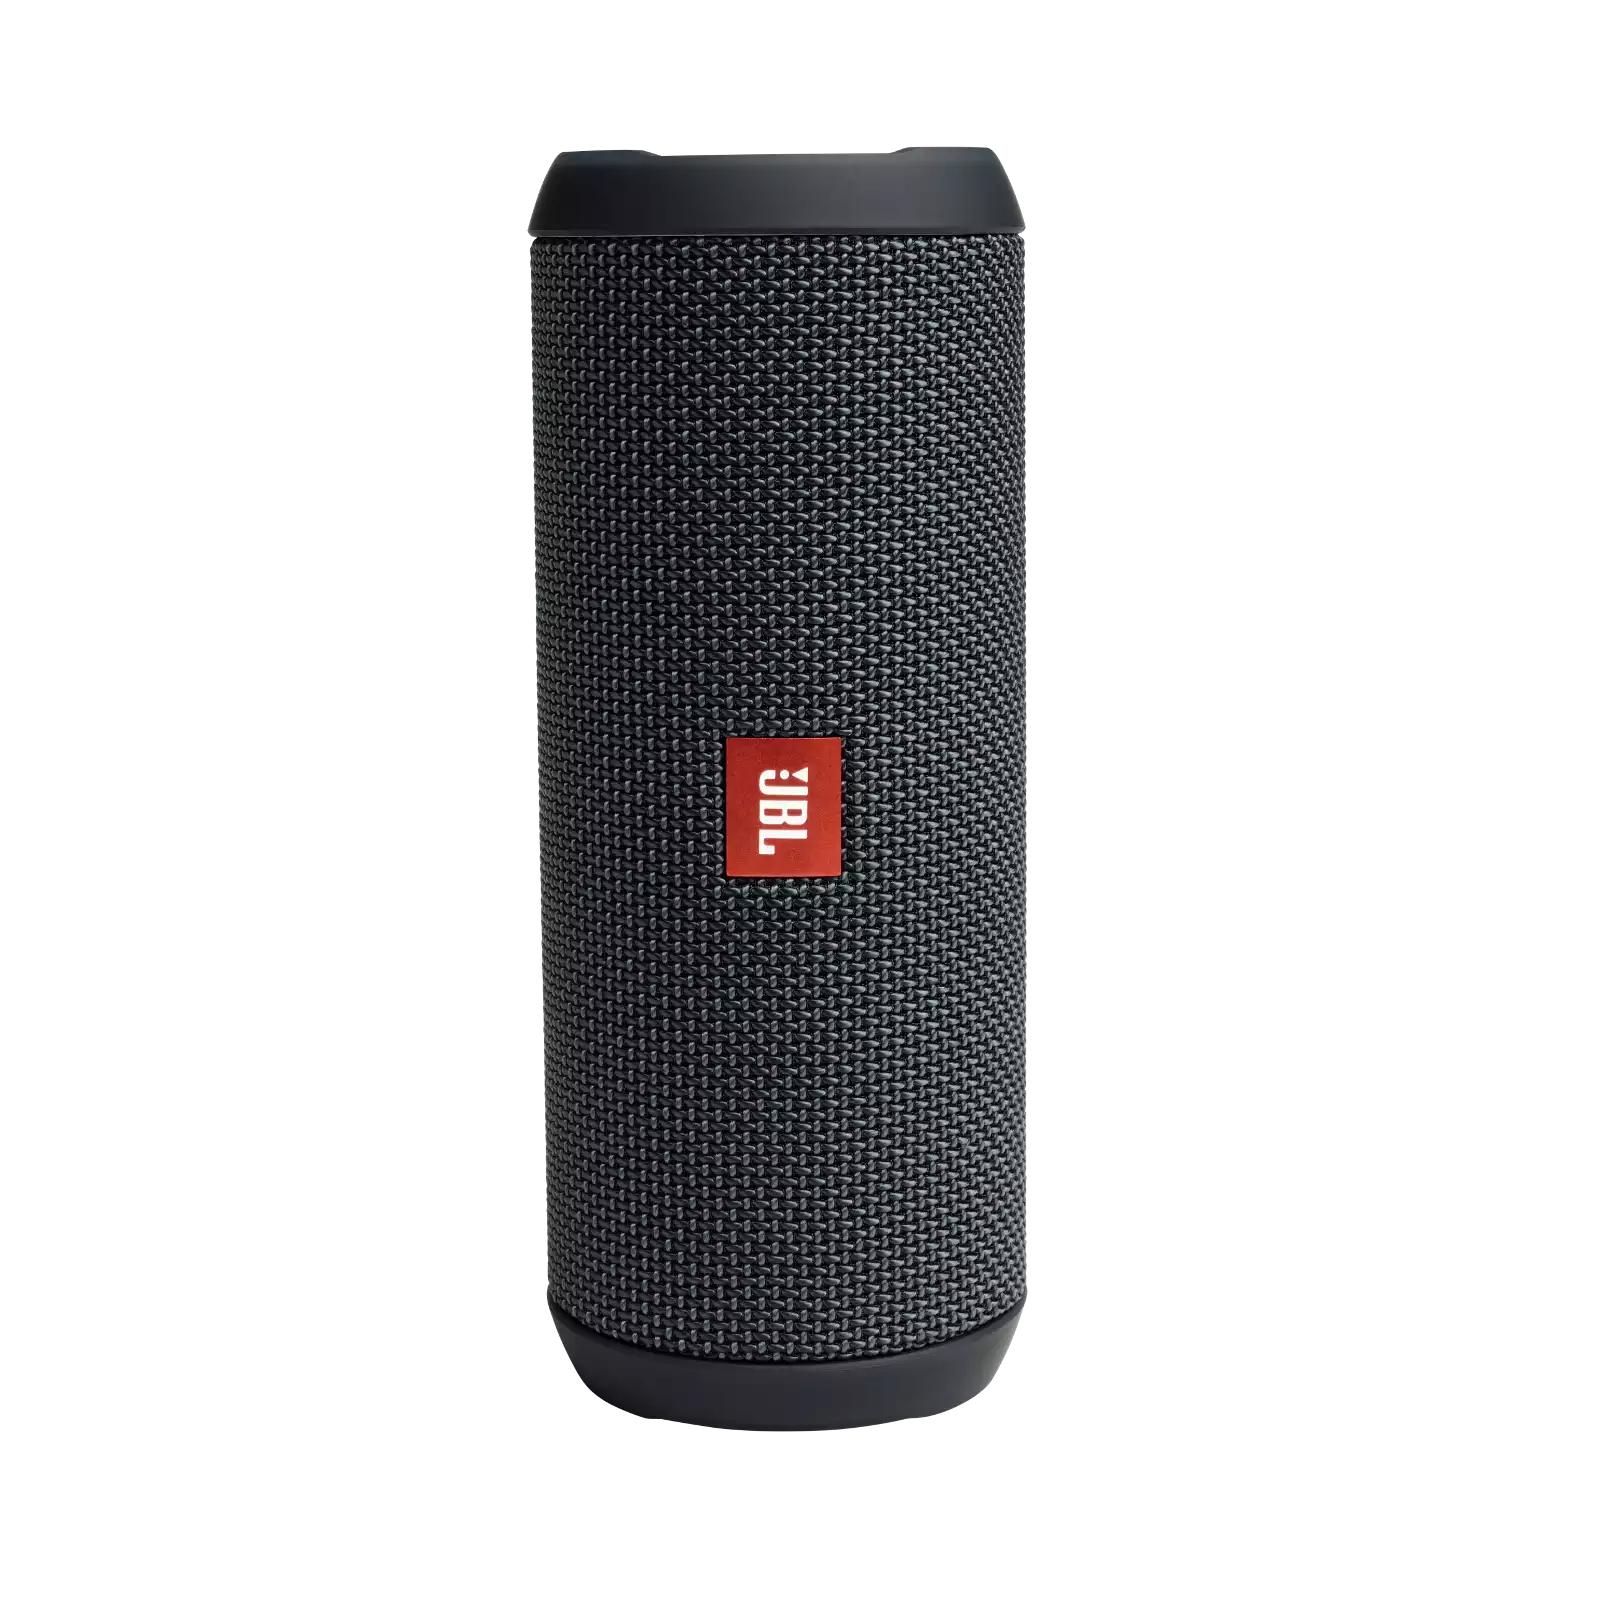 JBL Flip Essential Portable Bluetooth® speaker - £50 instore only @ B&M, Glasgow